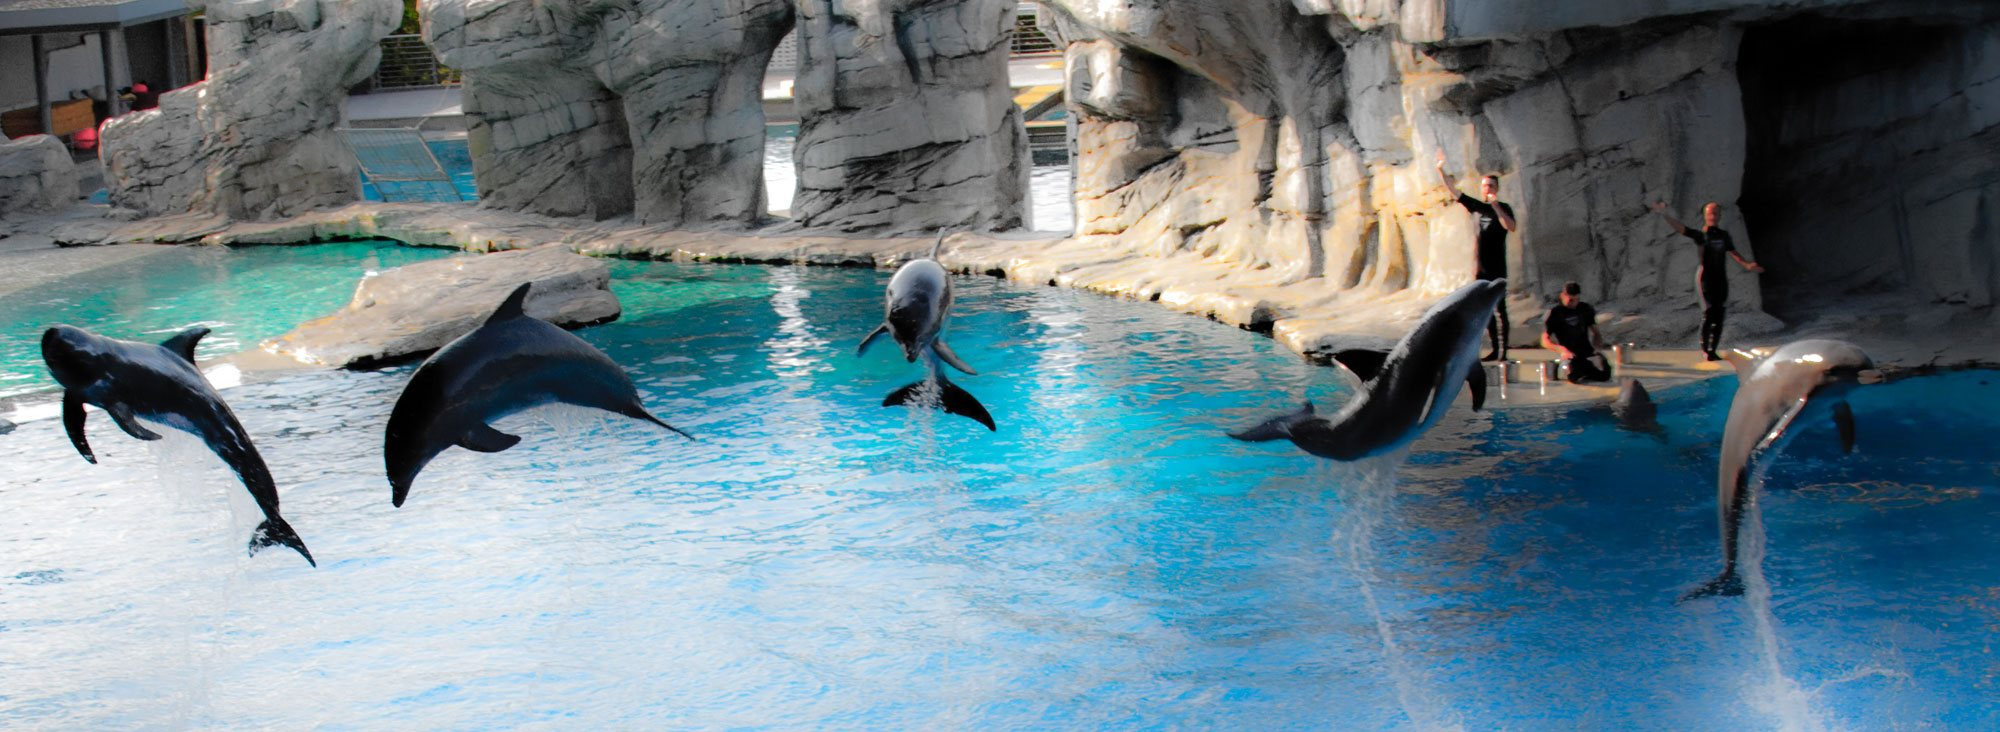 Les parcs d'attractions de la Riviera Romagnole